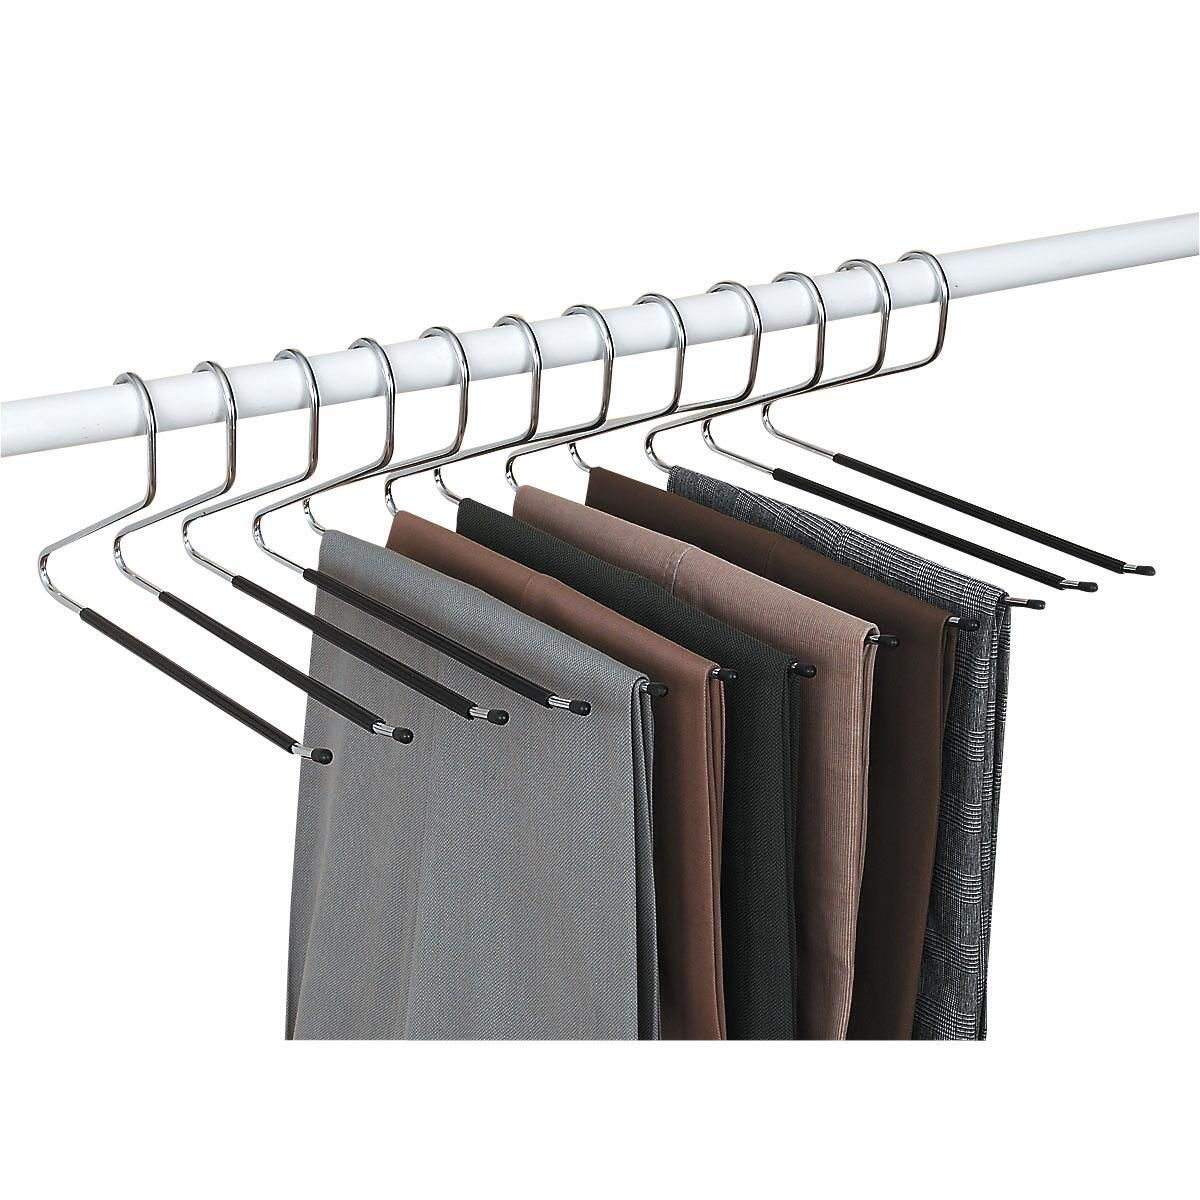 Pants Hangers | Lillian Vernon